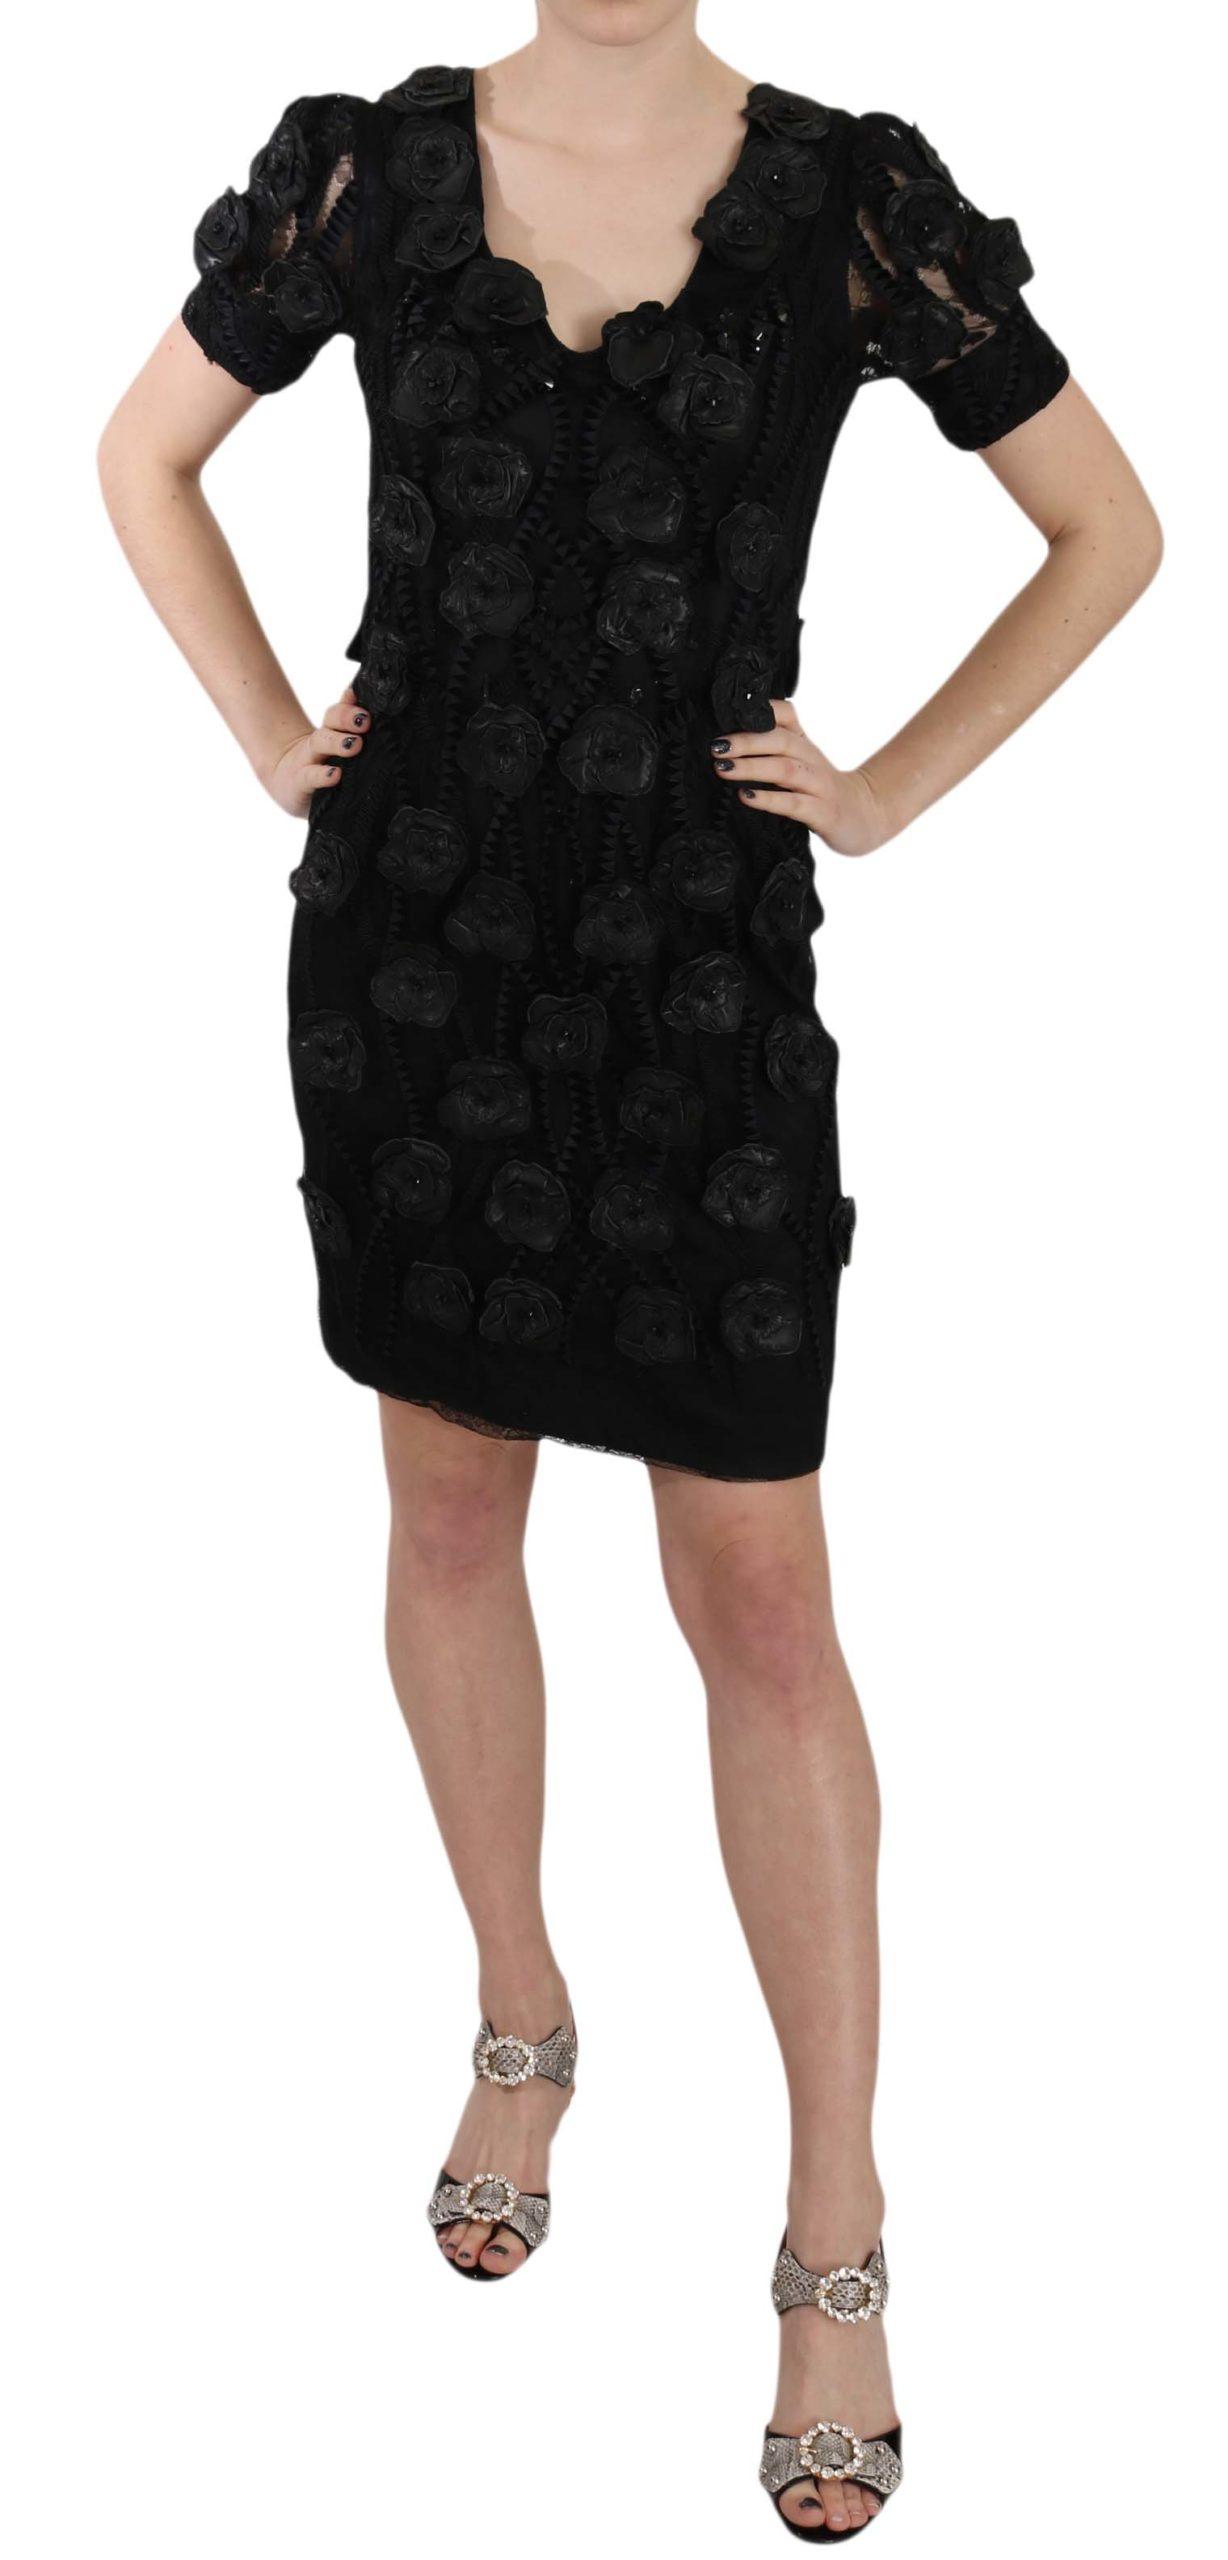 John Richmond Women's Silk Leather Flowers Sheath Dress Black DR1677BG - IT42|M